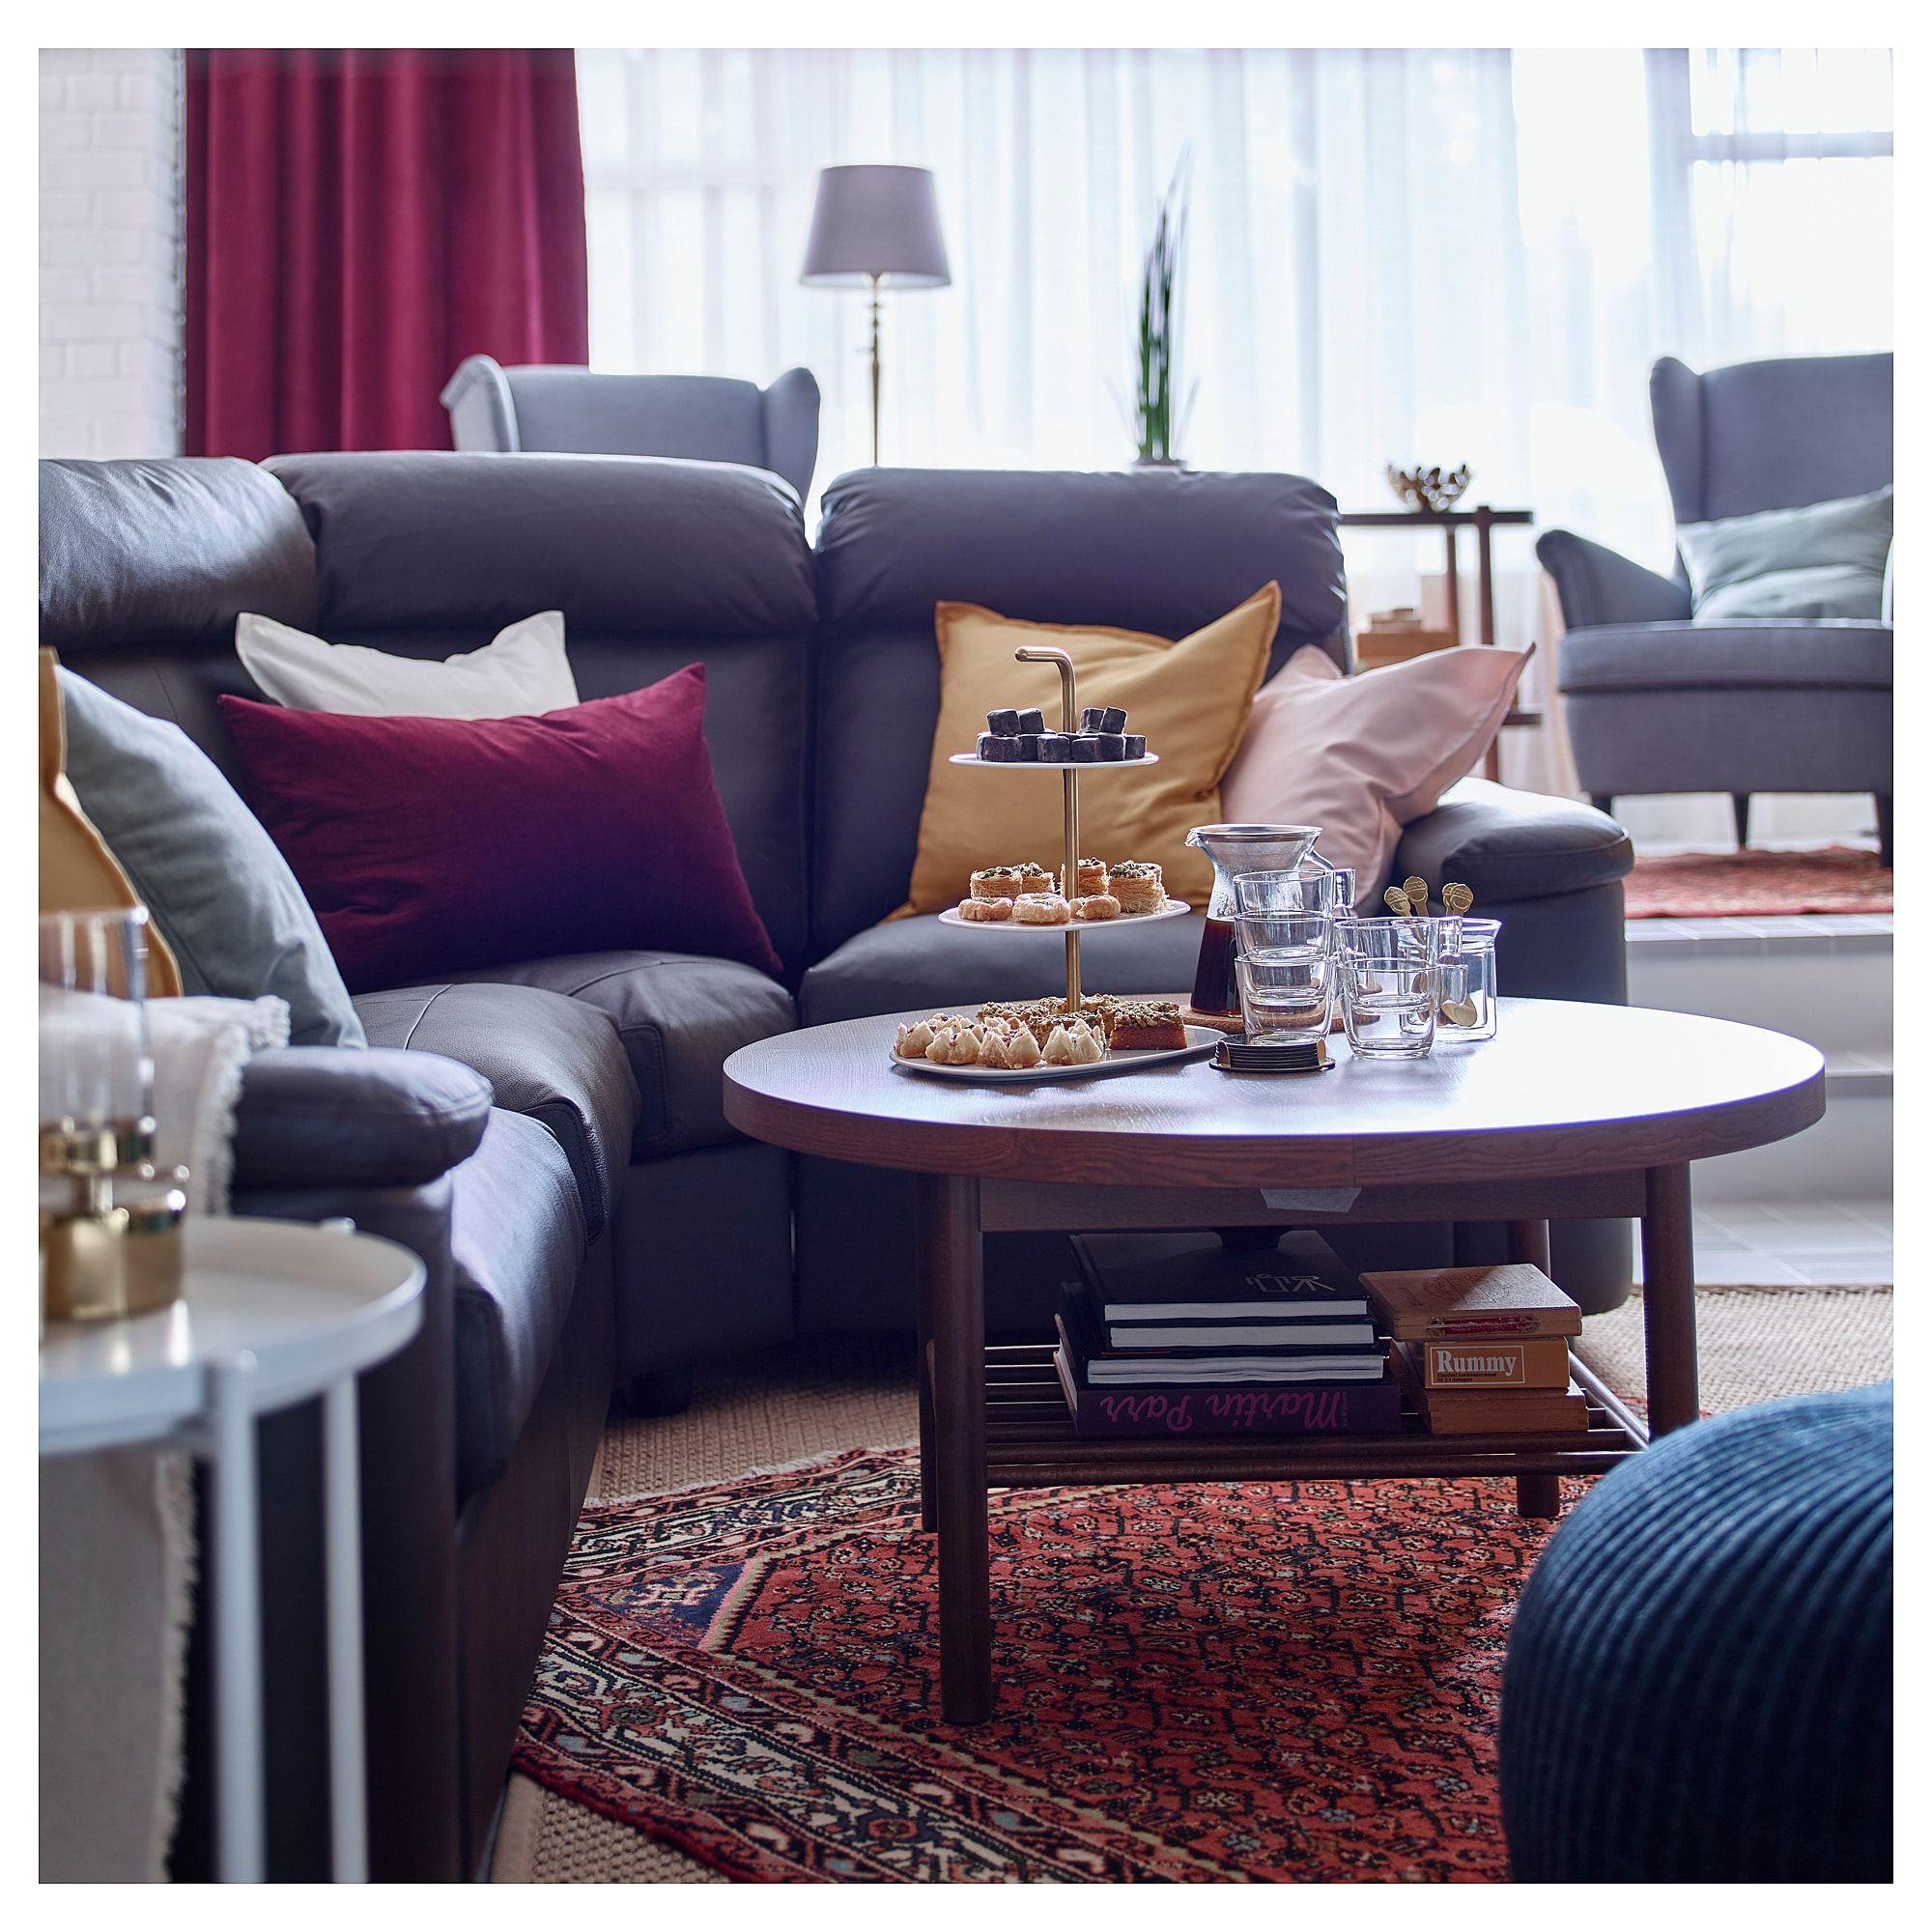 Listerby Coffee Table Brown 35 3 8 Ikea Coffee Table Living Room Corner Farm House Living Room [ 2000 x 2000 Pixel ]